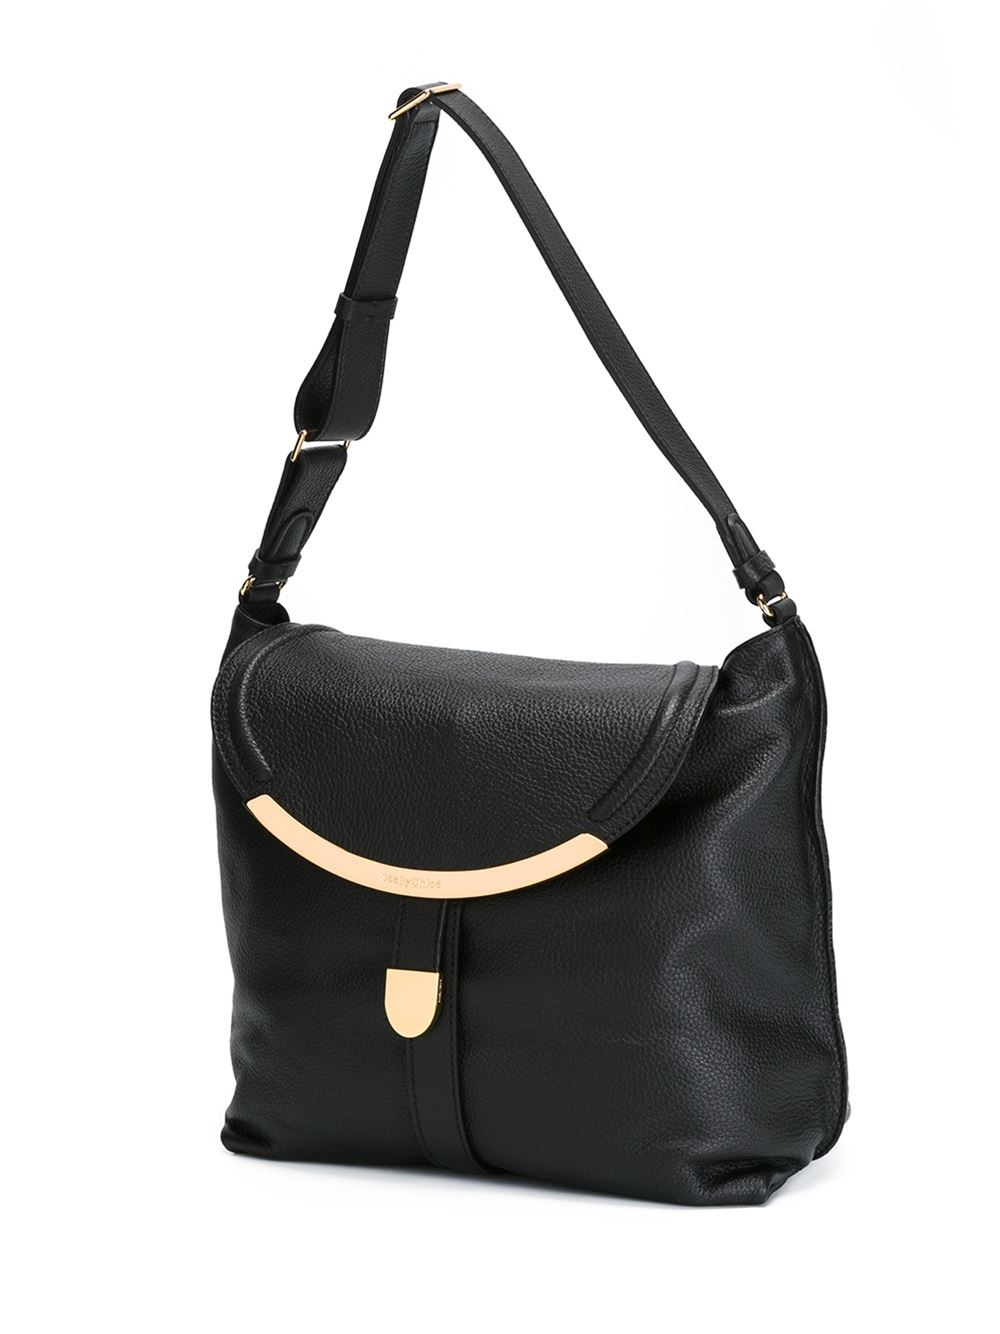 See by chloé 'Lizzie' Shoulder Bag in Black   Lyst